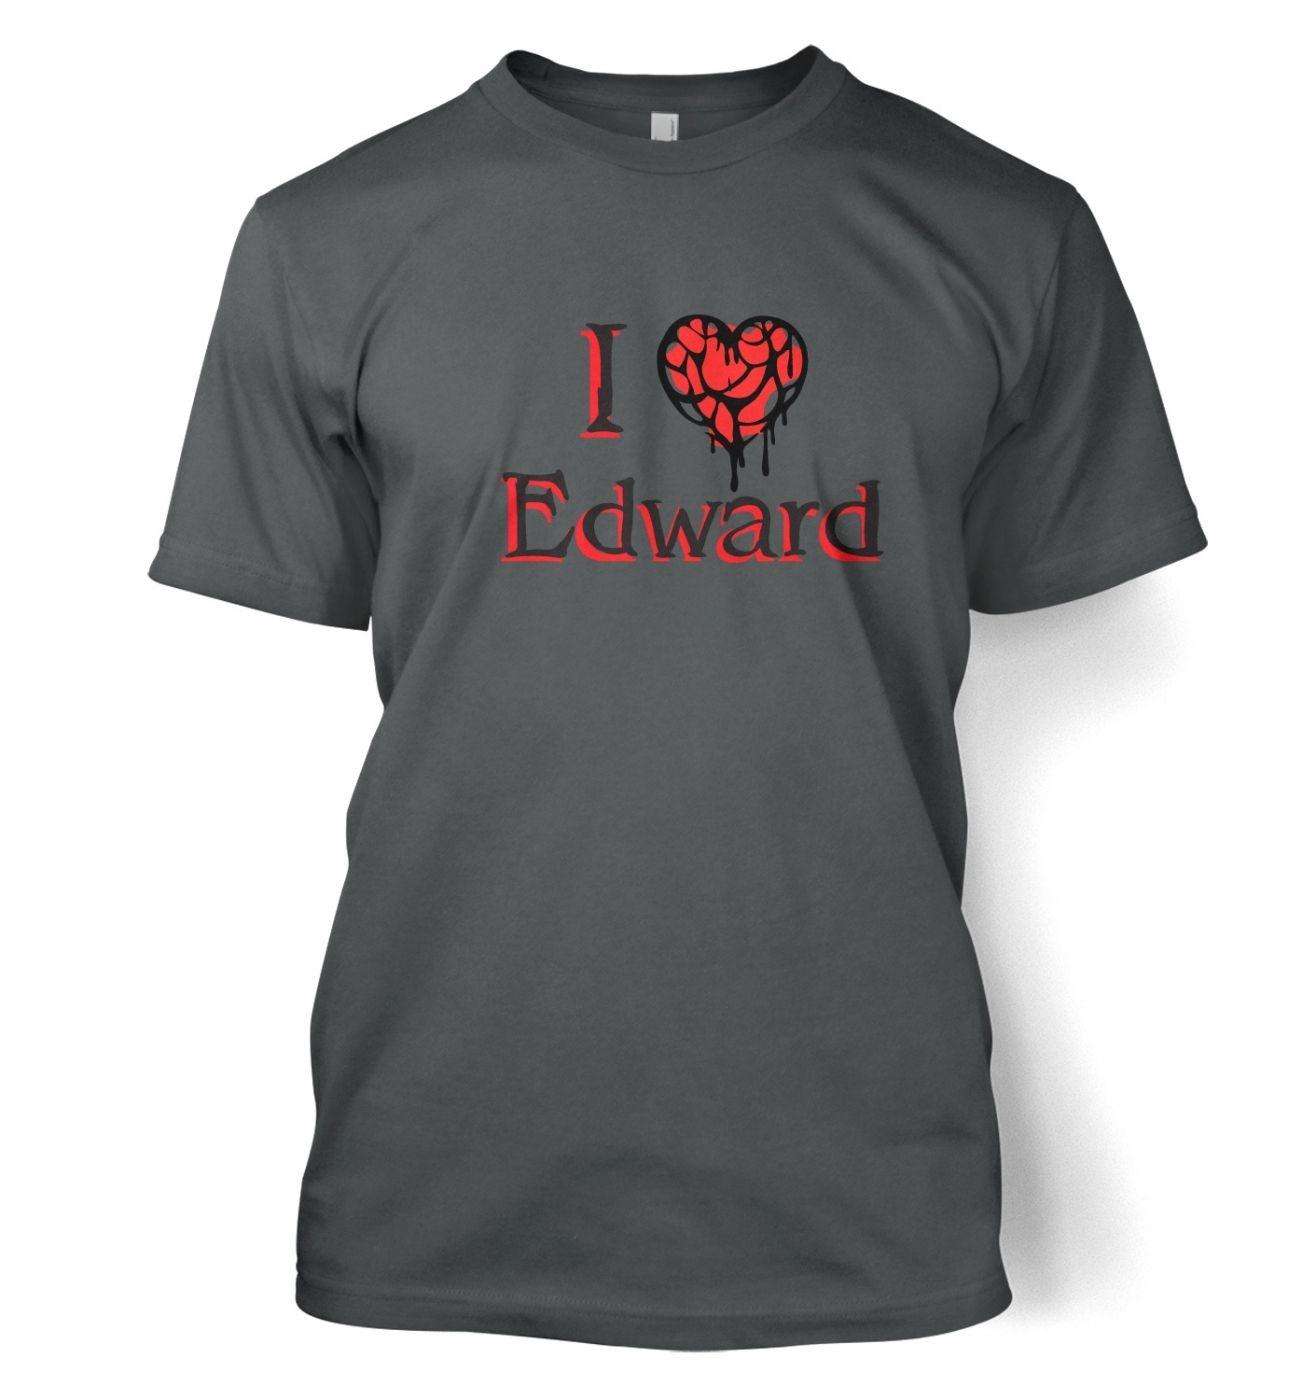 I Heart Edward men's t-shirt